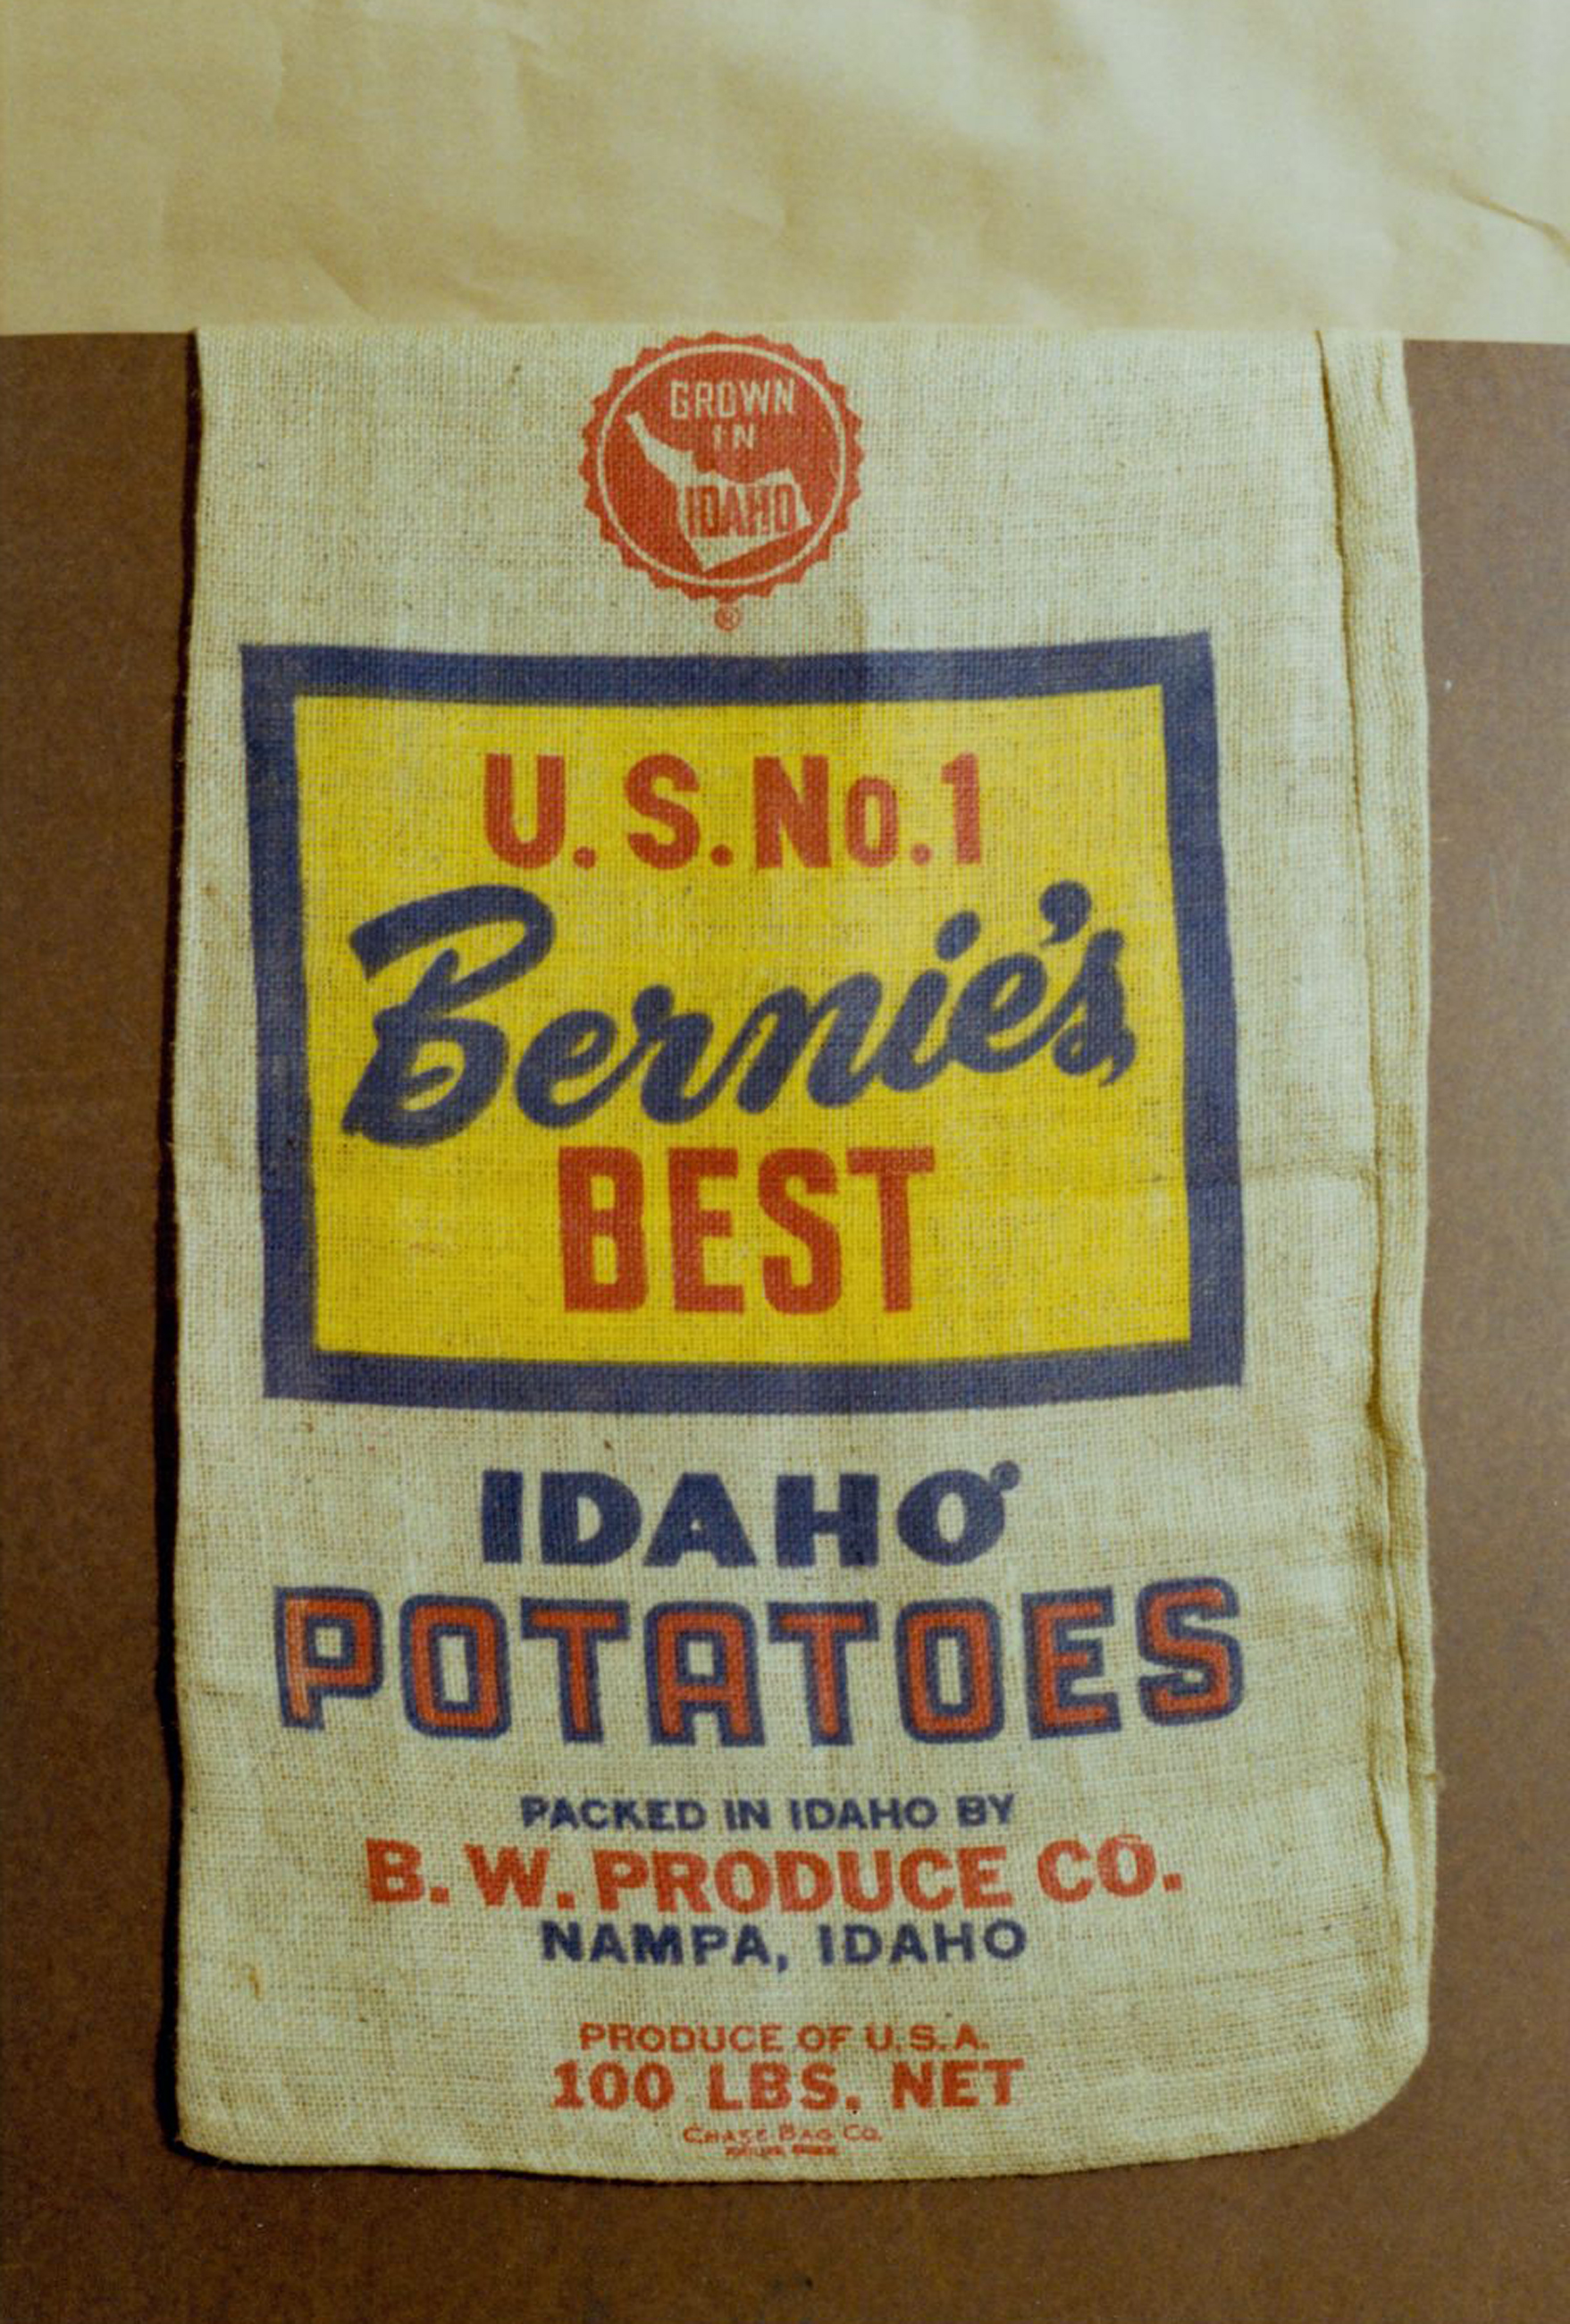 Potato packing